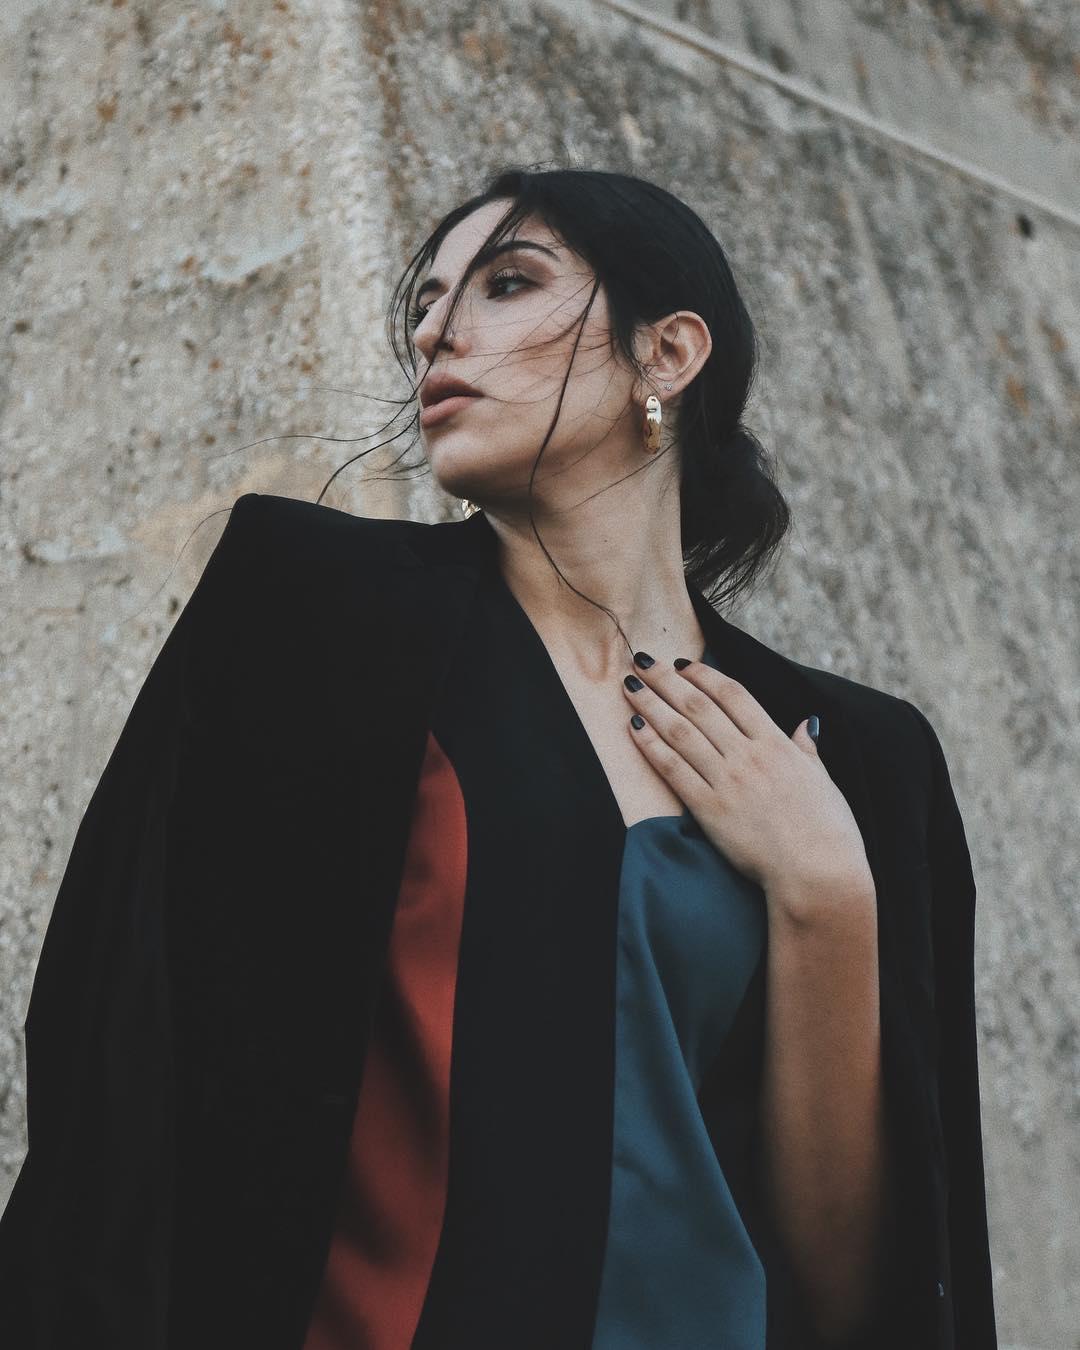 Consciously Connected Travel - CC Journal - My City Series - Manar Mostafa Asaad  - Tripoli, Beirut, Lebanon